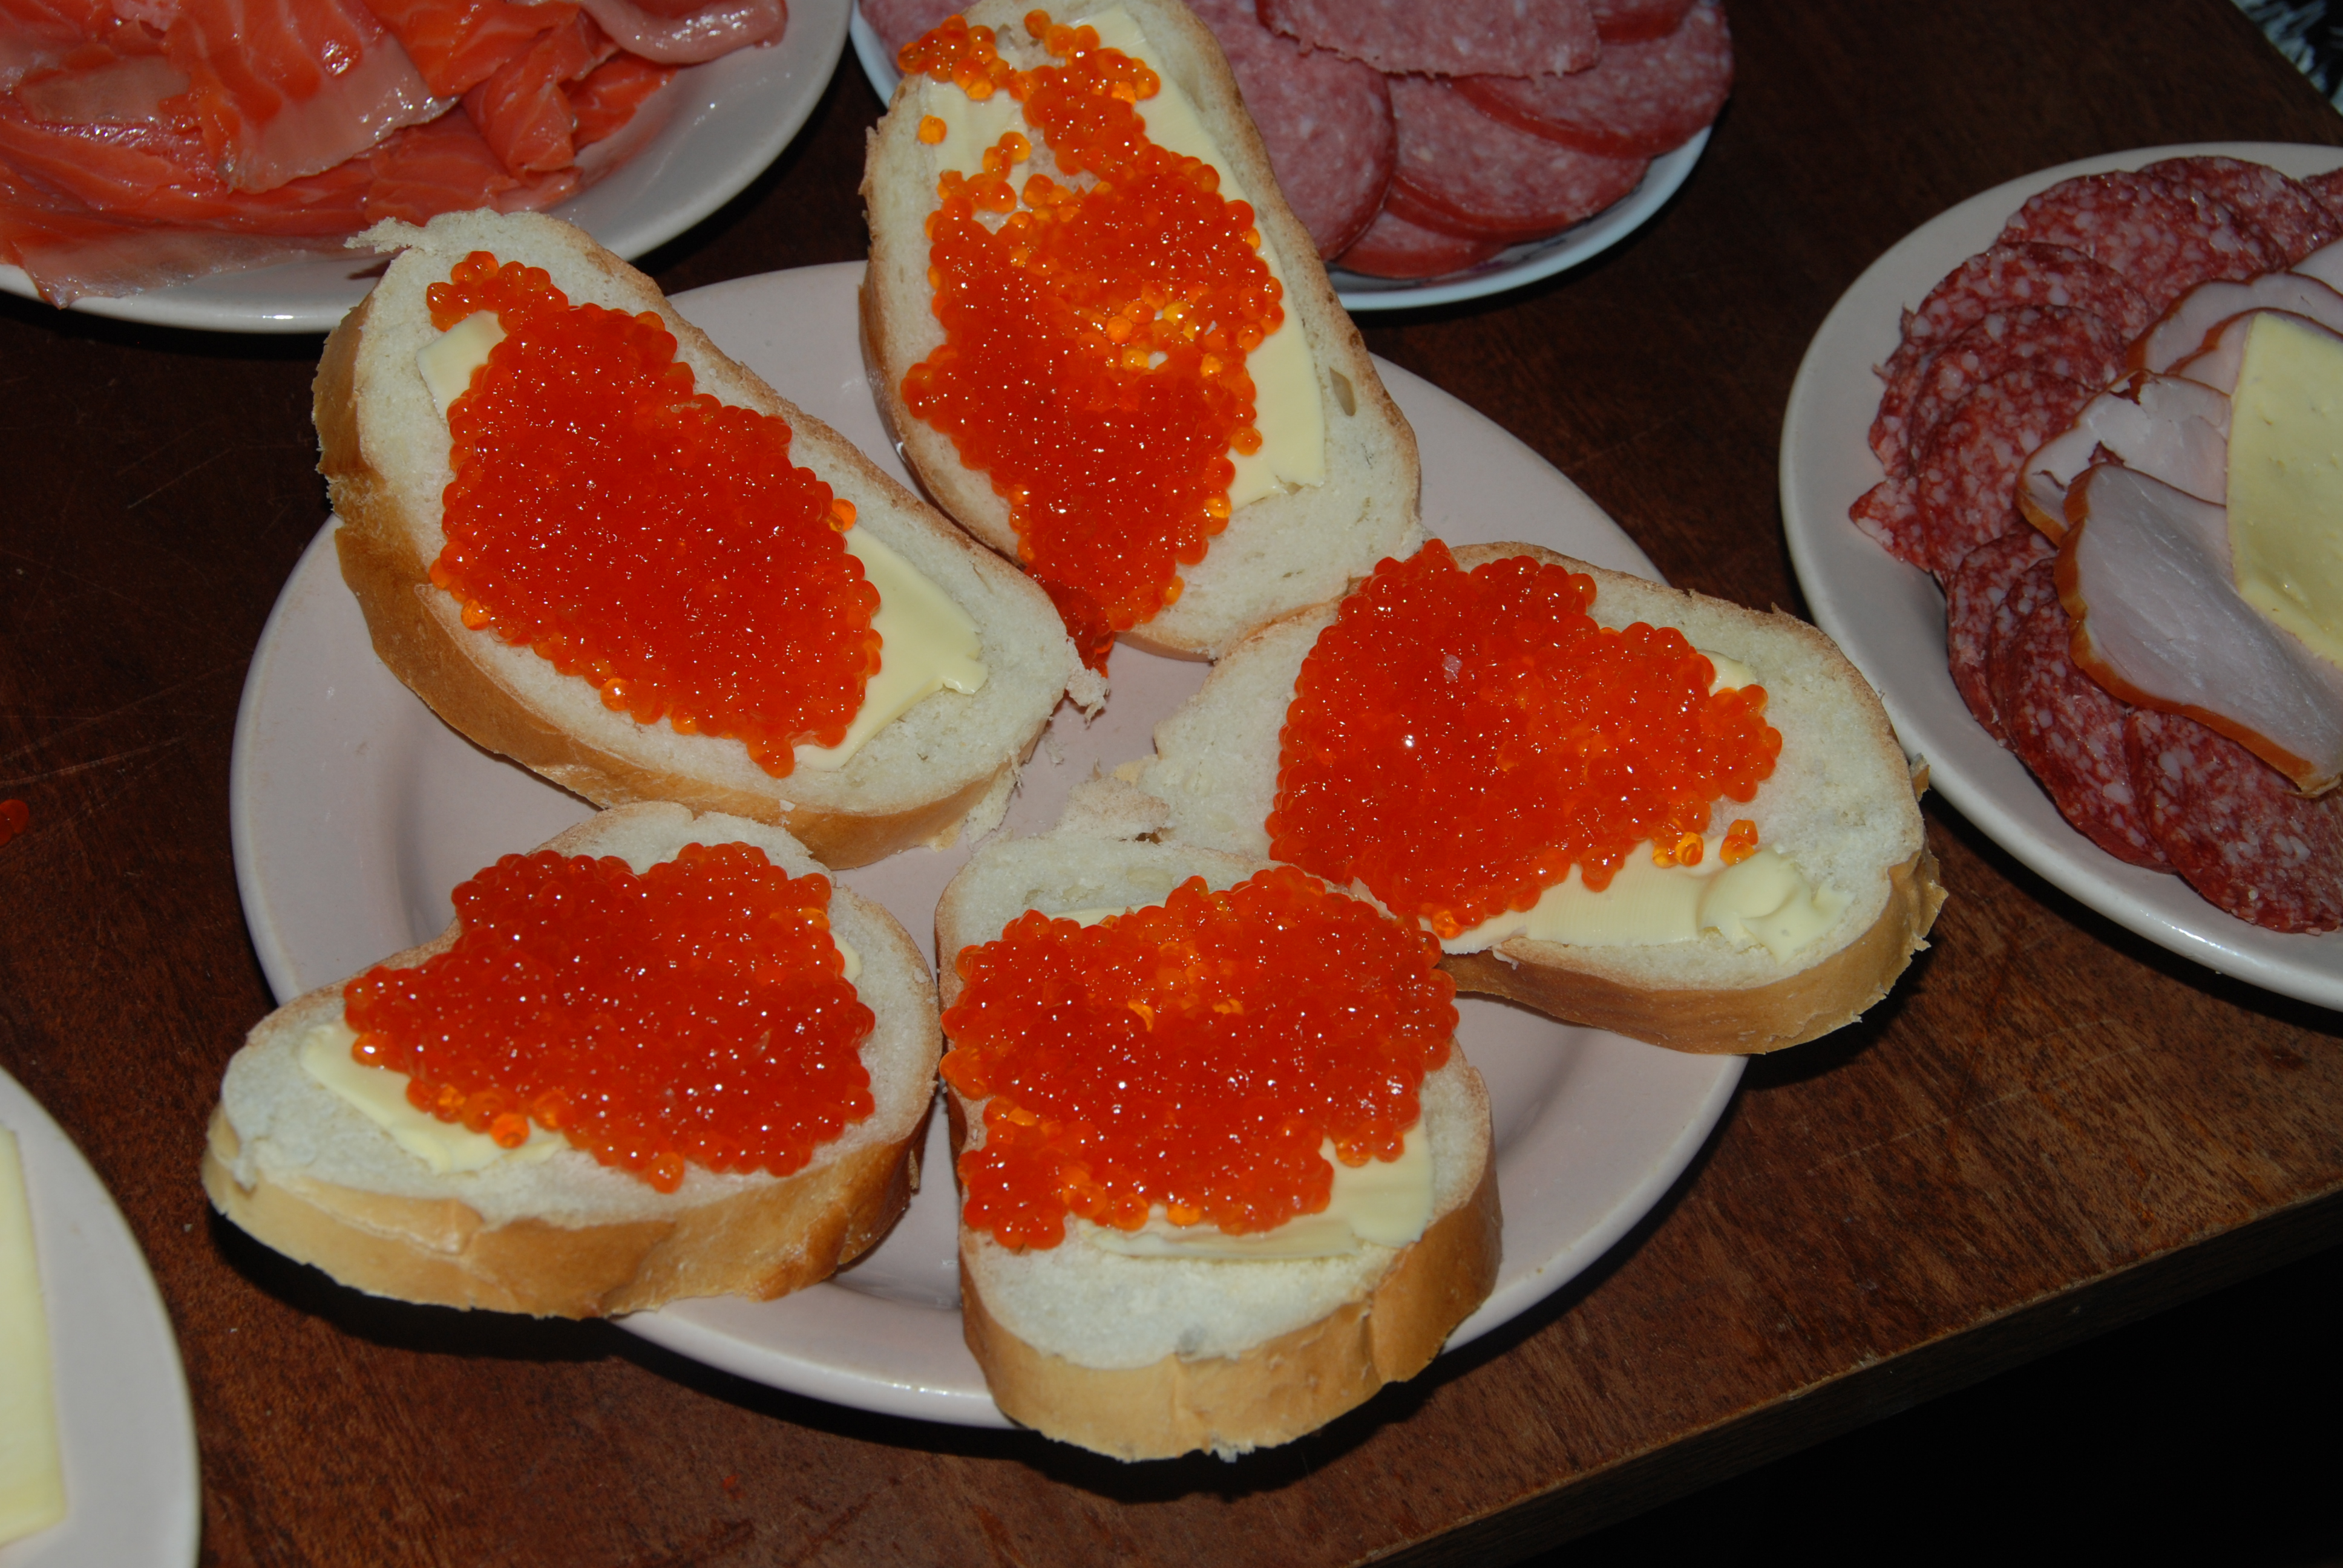 http://dic.academic.ru/pictures/wiki/files/67/Caviar_butterbrot.jpg